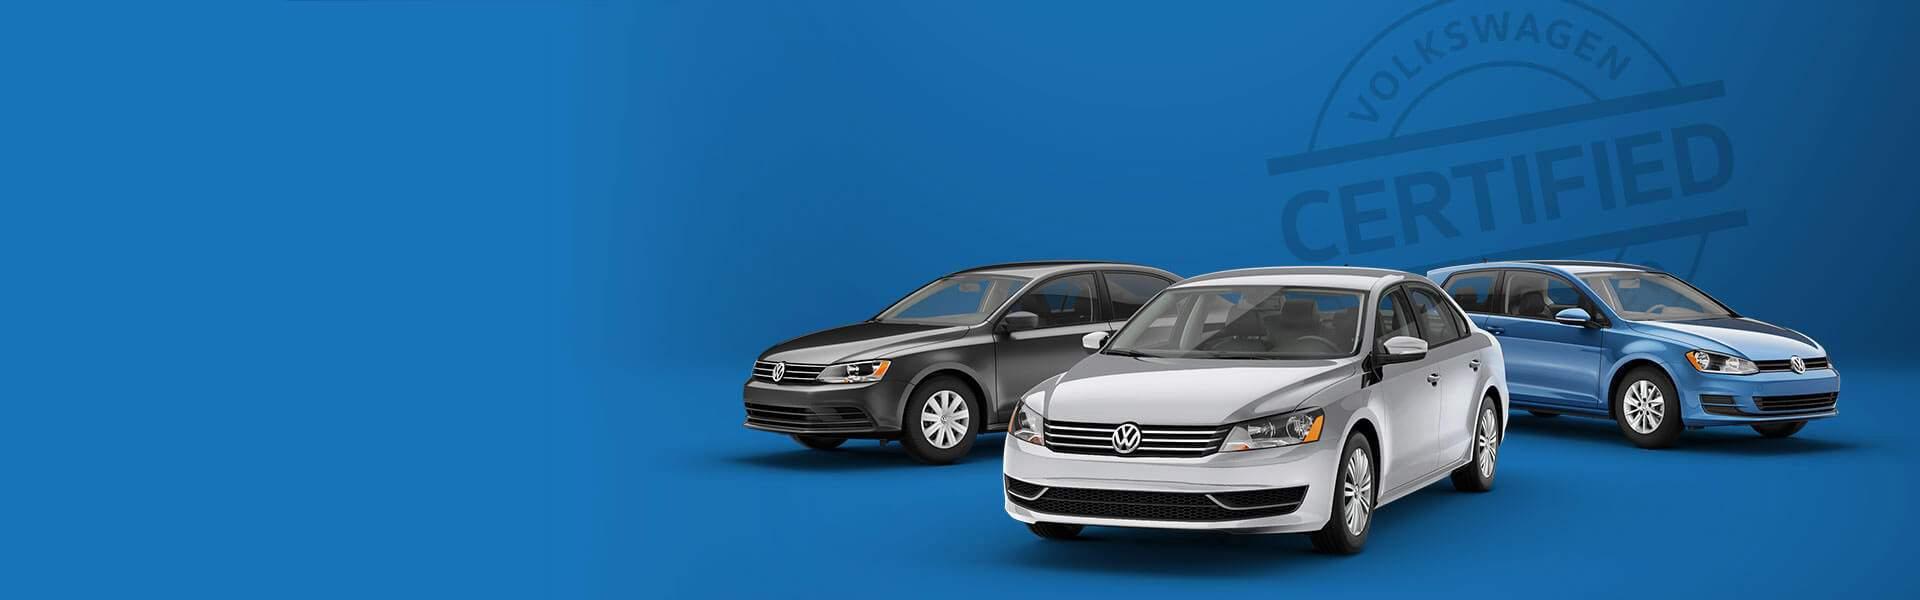 Volkswagen Certified Pre-Owned in Salinas, CA